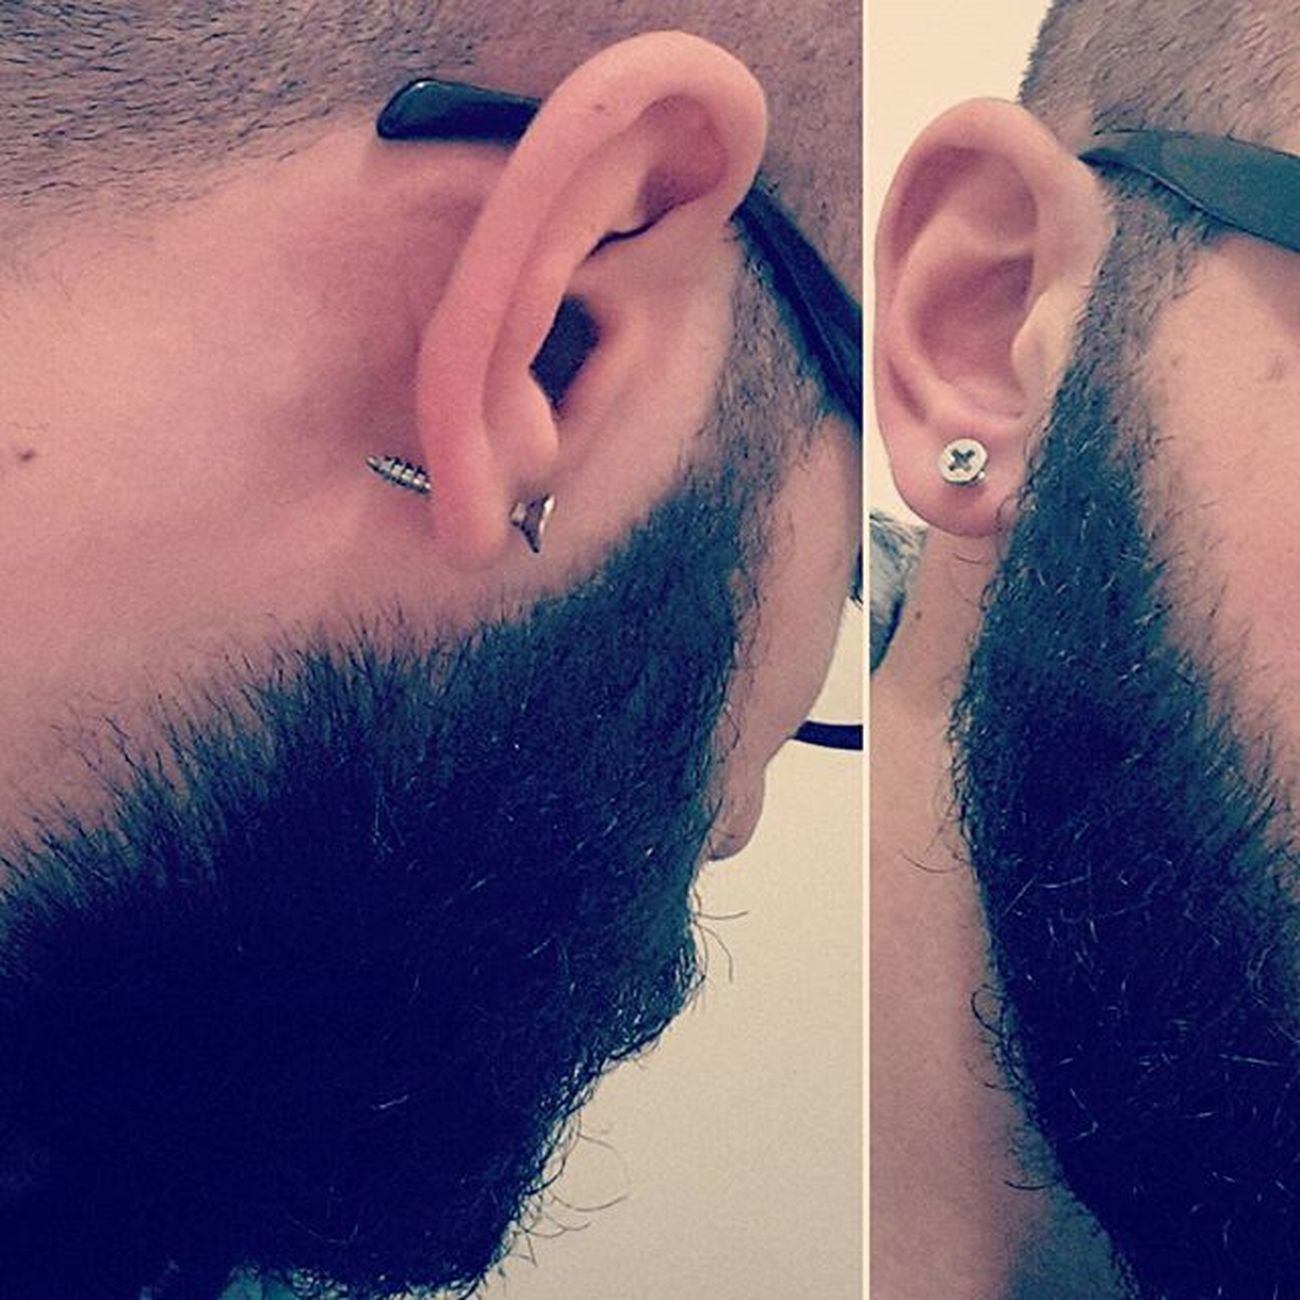 New Peircings Yeni Küpe Screw Vida Beard Beardgang Beardedboy Beardporn Btfu Igers Igersoftheday TBT  Stylish Boy Instalike Instabeard Instaboy Instapeircing Tagstagram Like4like Tagsforlikes Istanbul Beylikduzu